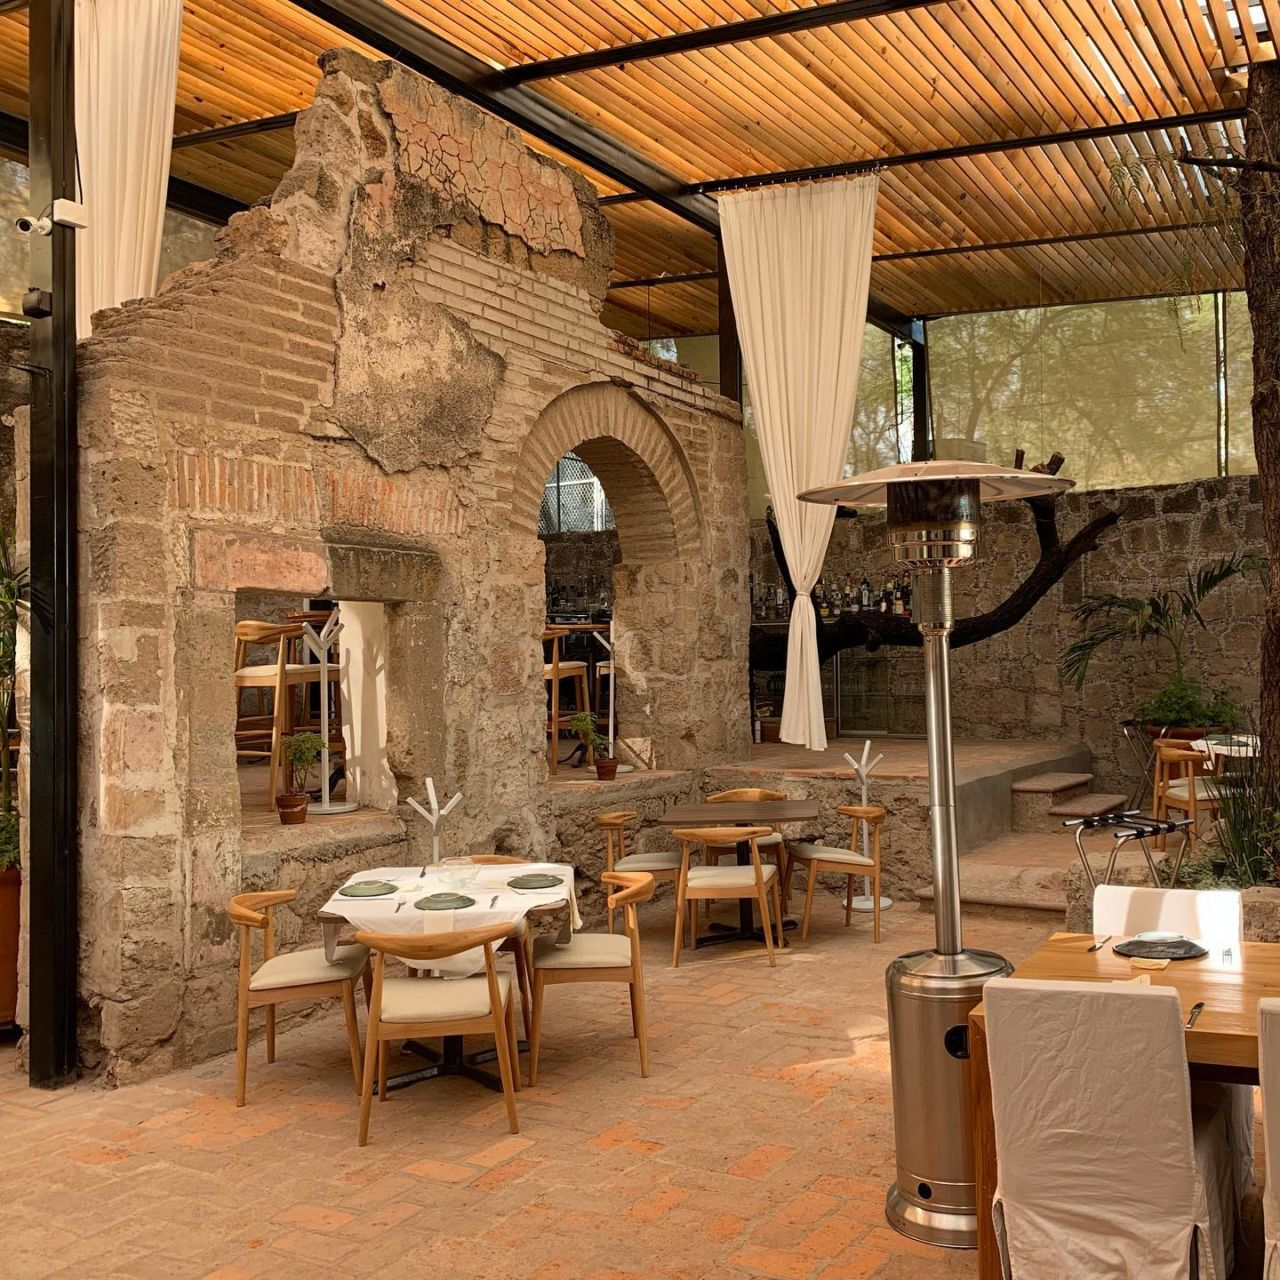 Este restaurante se encuentra dentro de un oasis de aguas termales en Aguascalientes